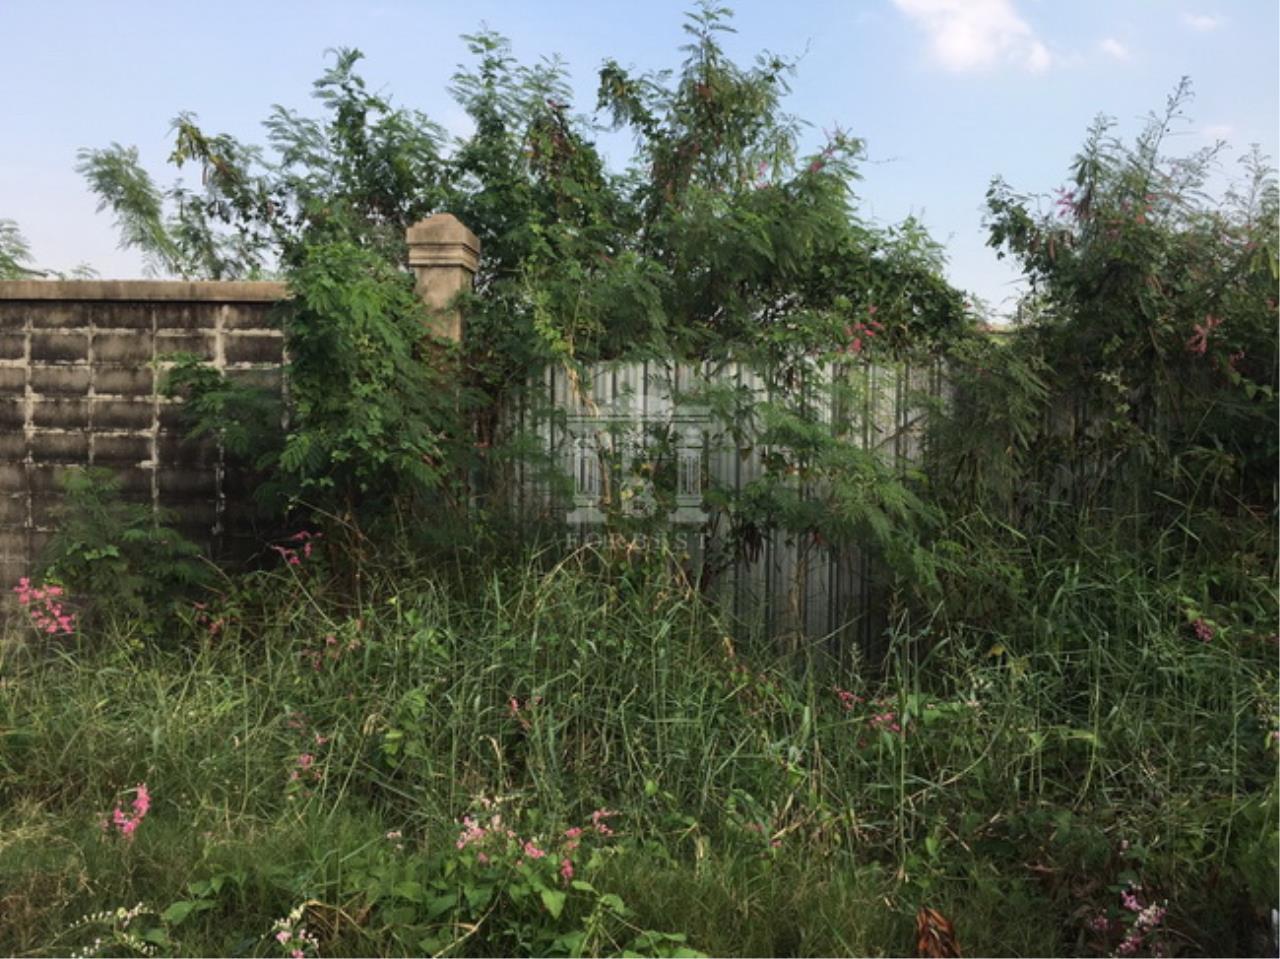 Forbest Properties Agency's 37844-Land for sale, on Phraek Sa road, 8 rai 203 sq.wa. 3